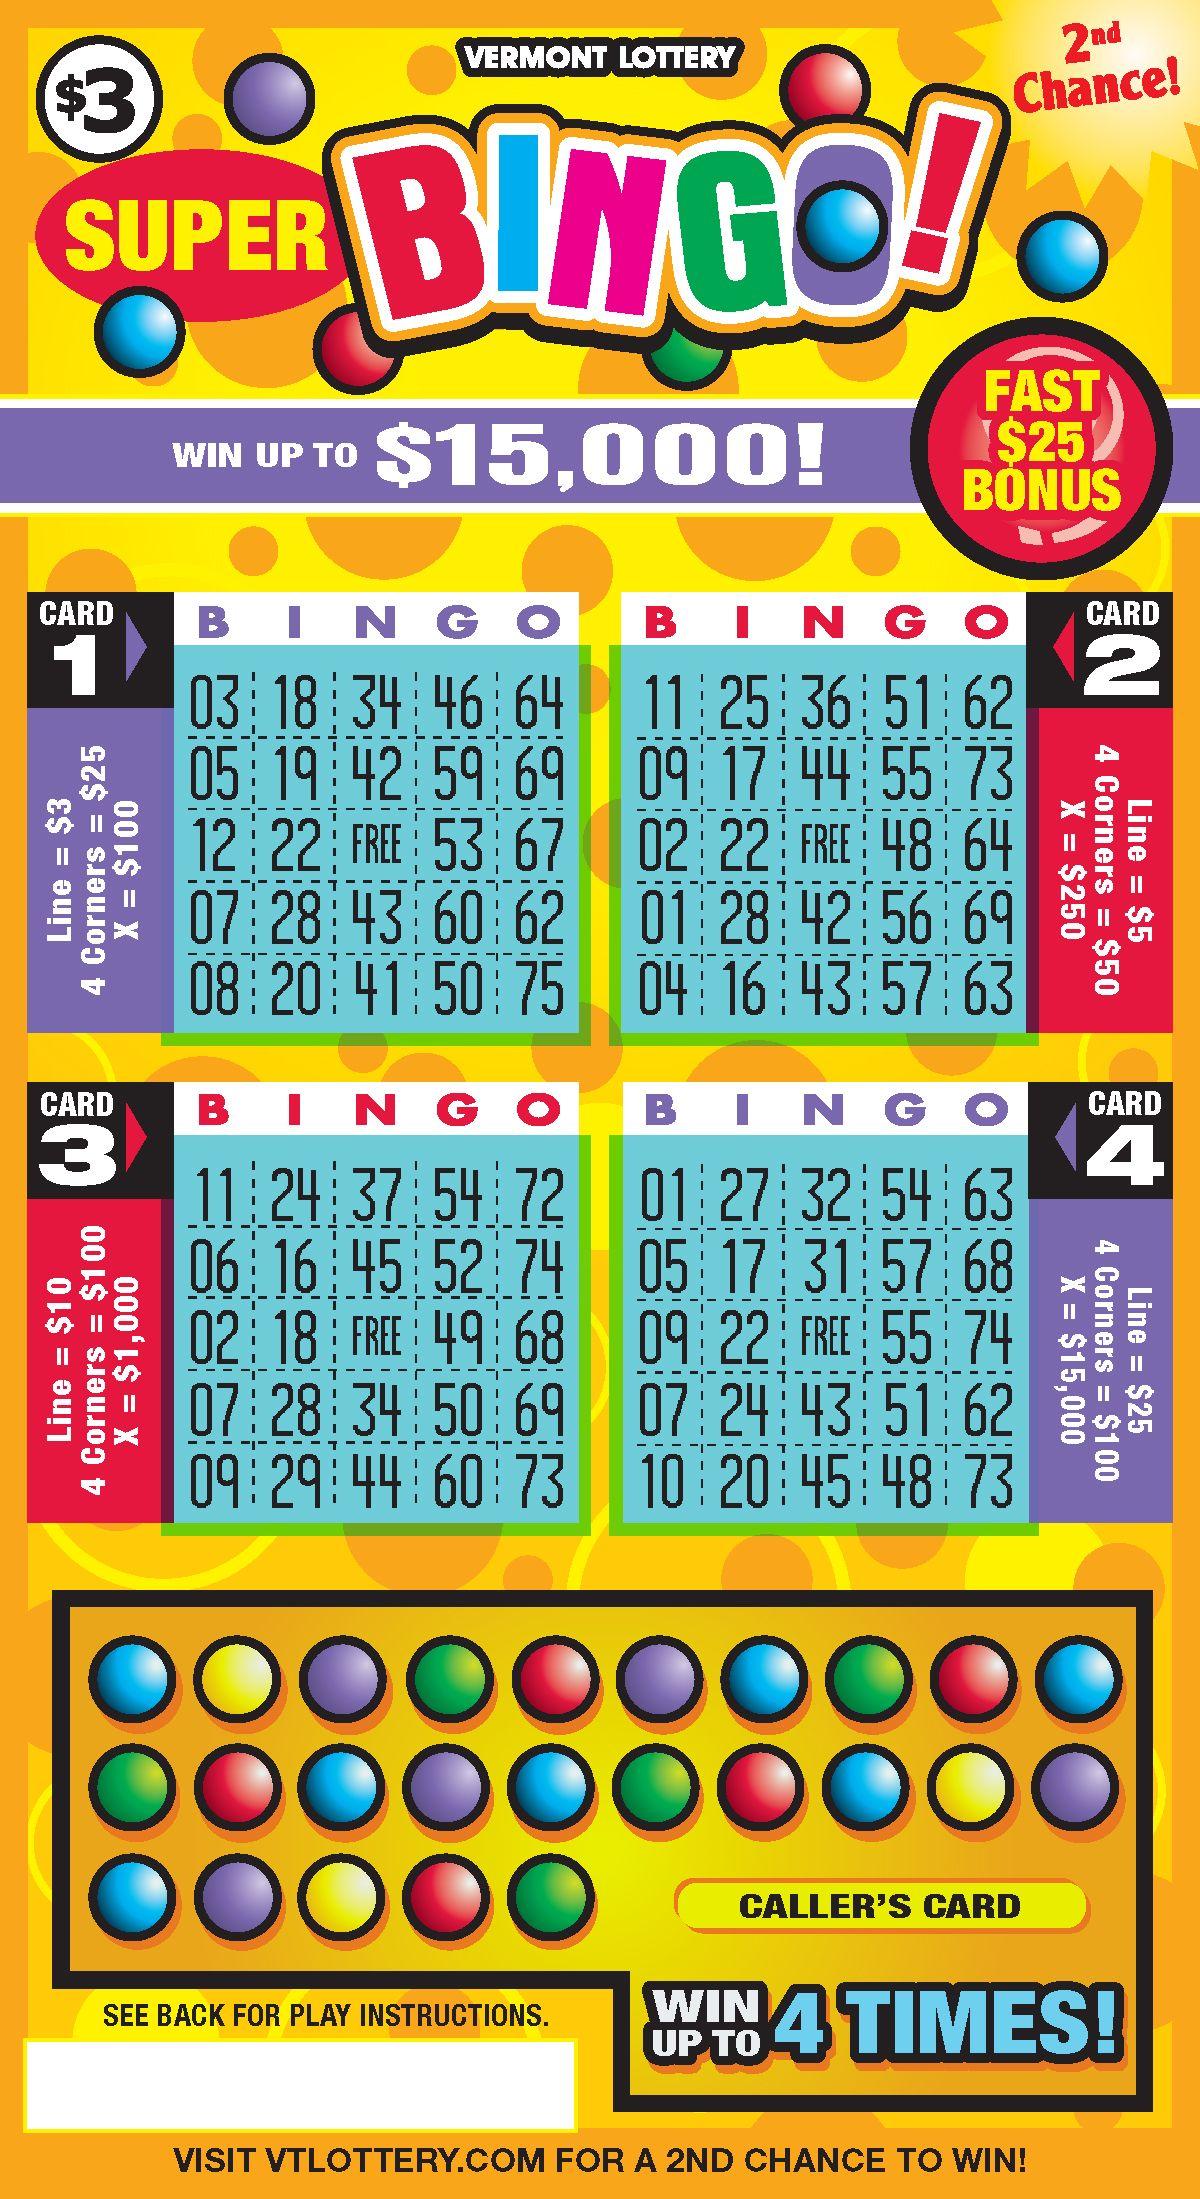 3 super bingo lottery education funding winning